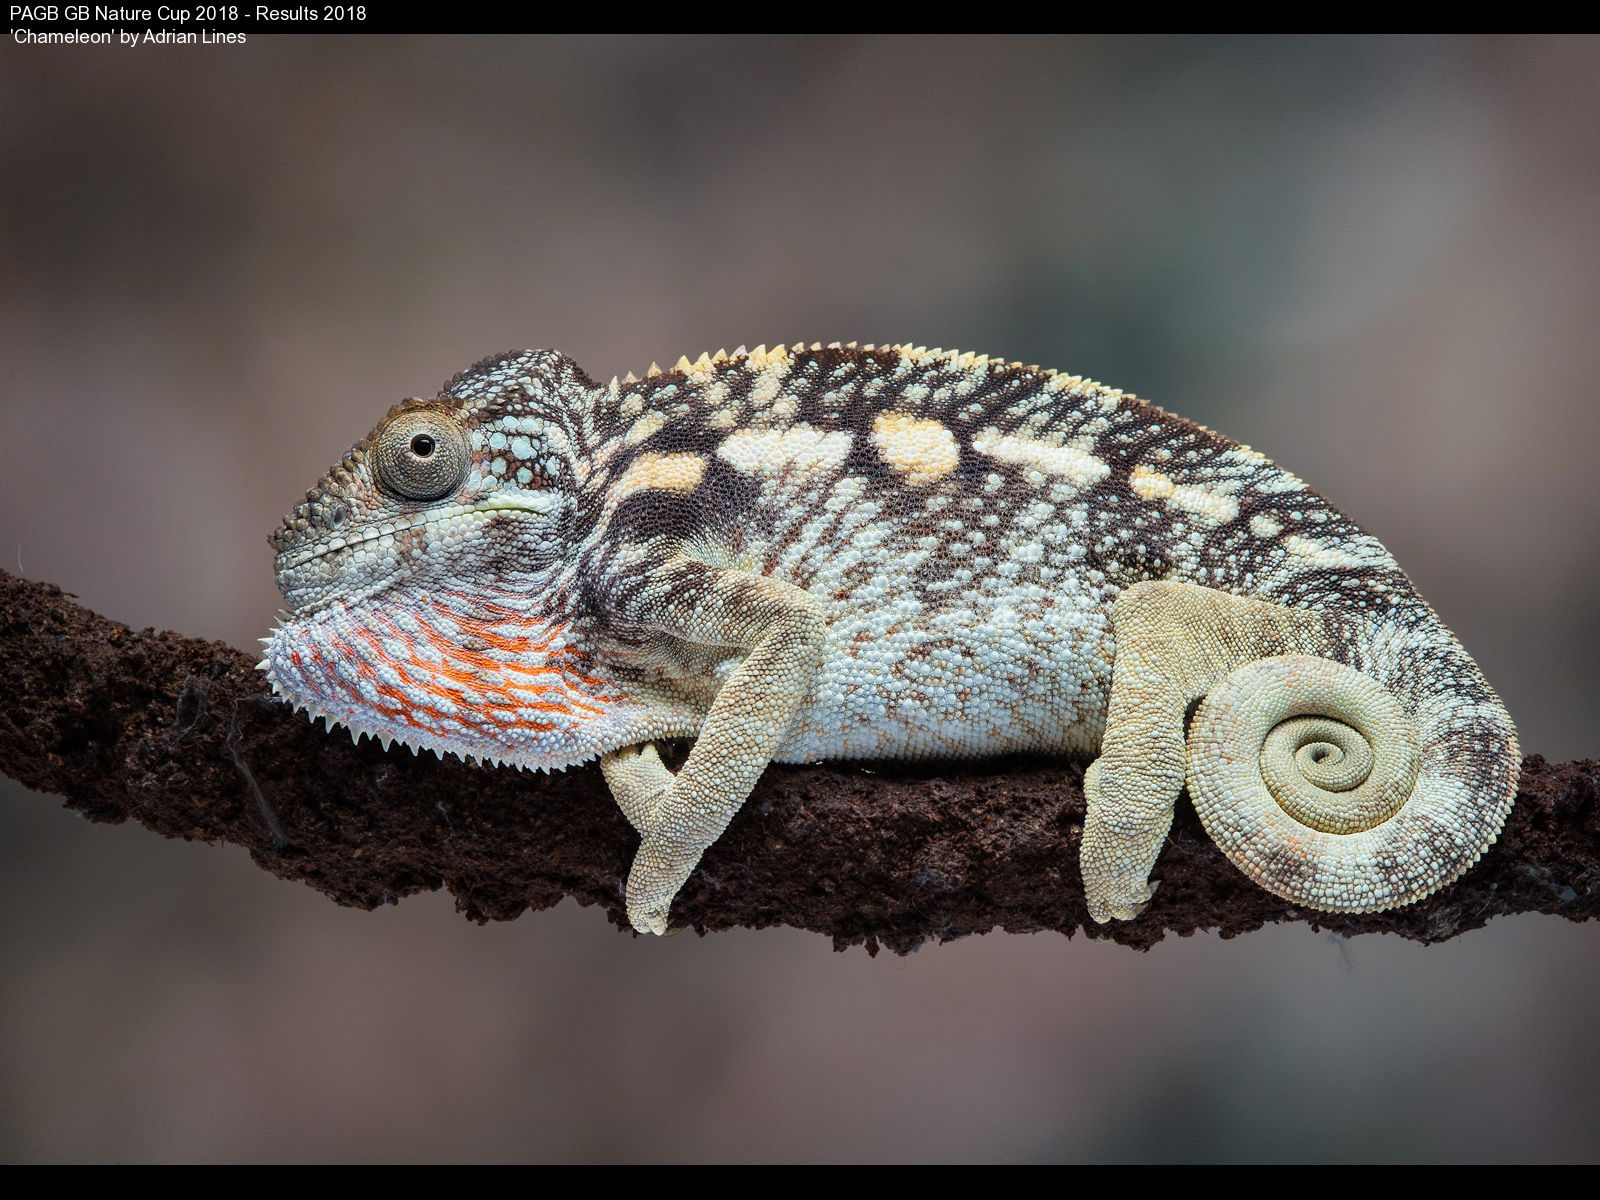 9392_Adrian Lines_Chameleon